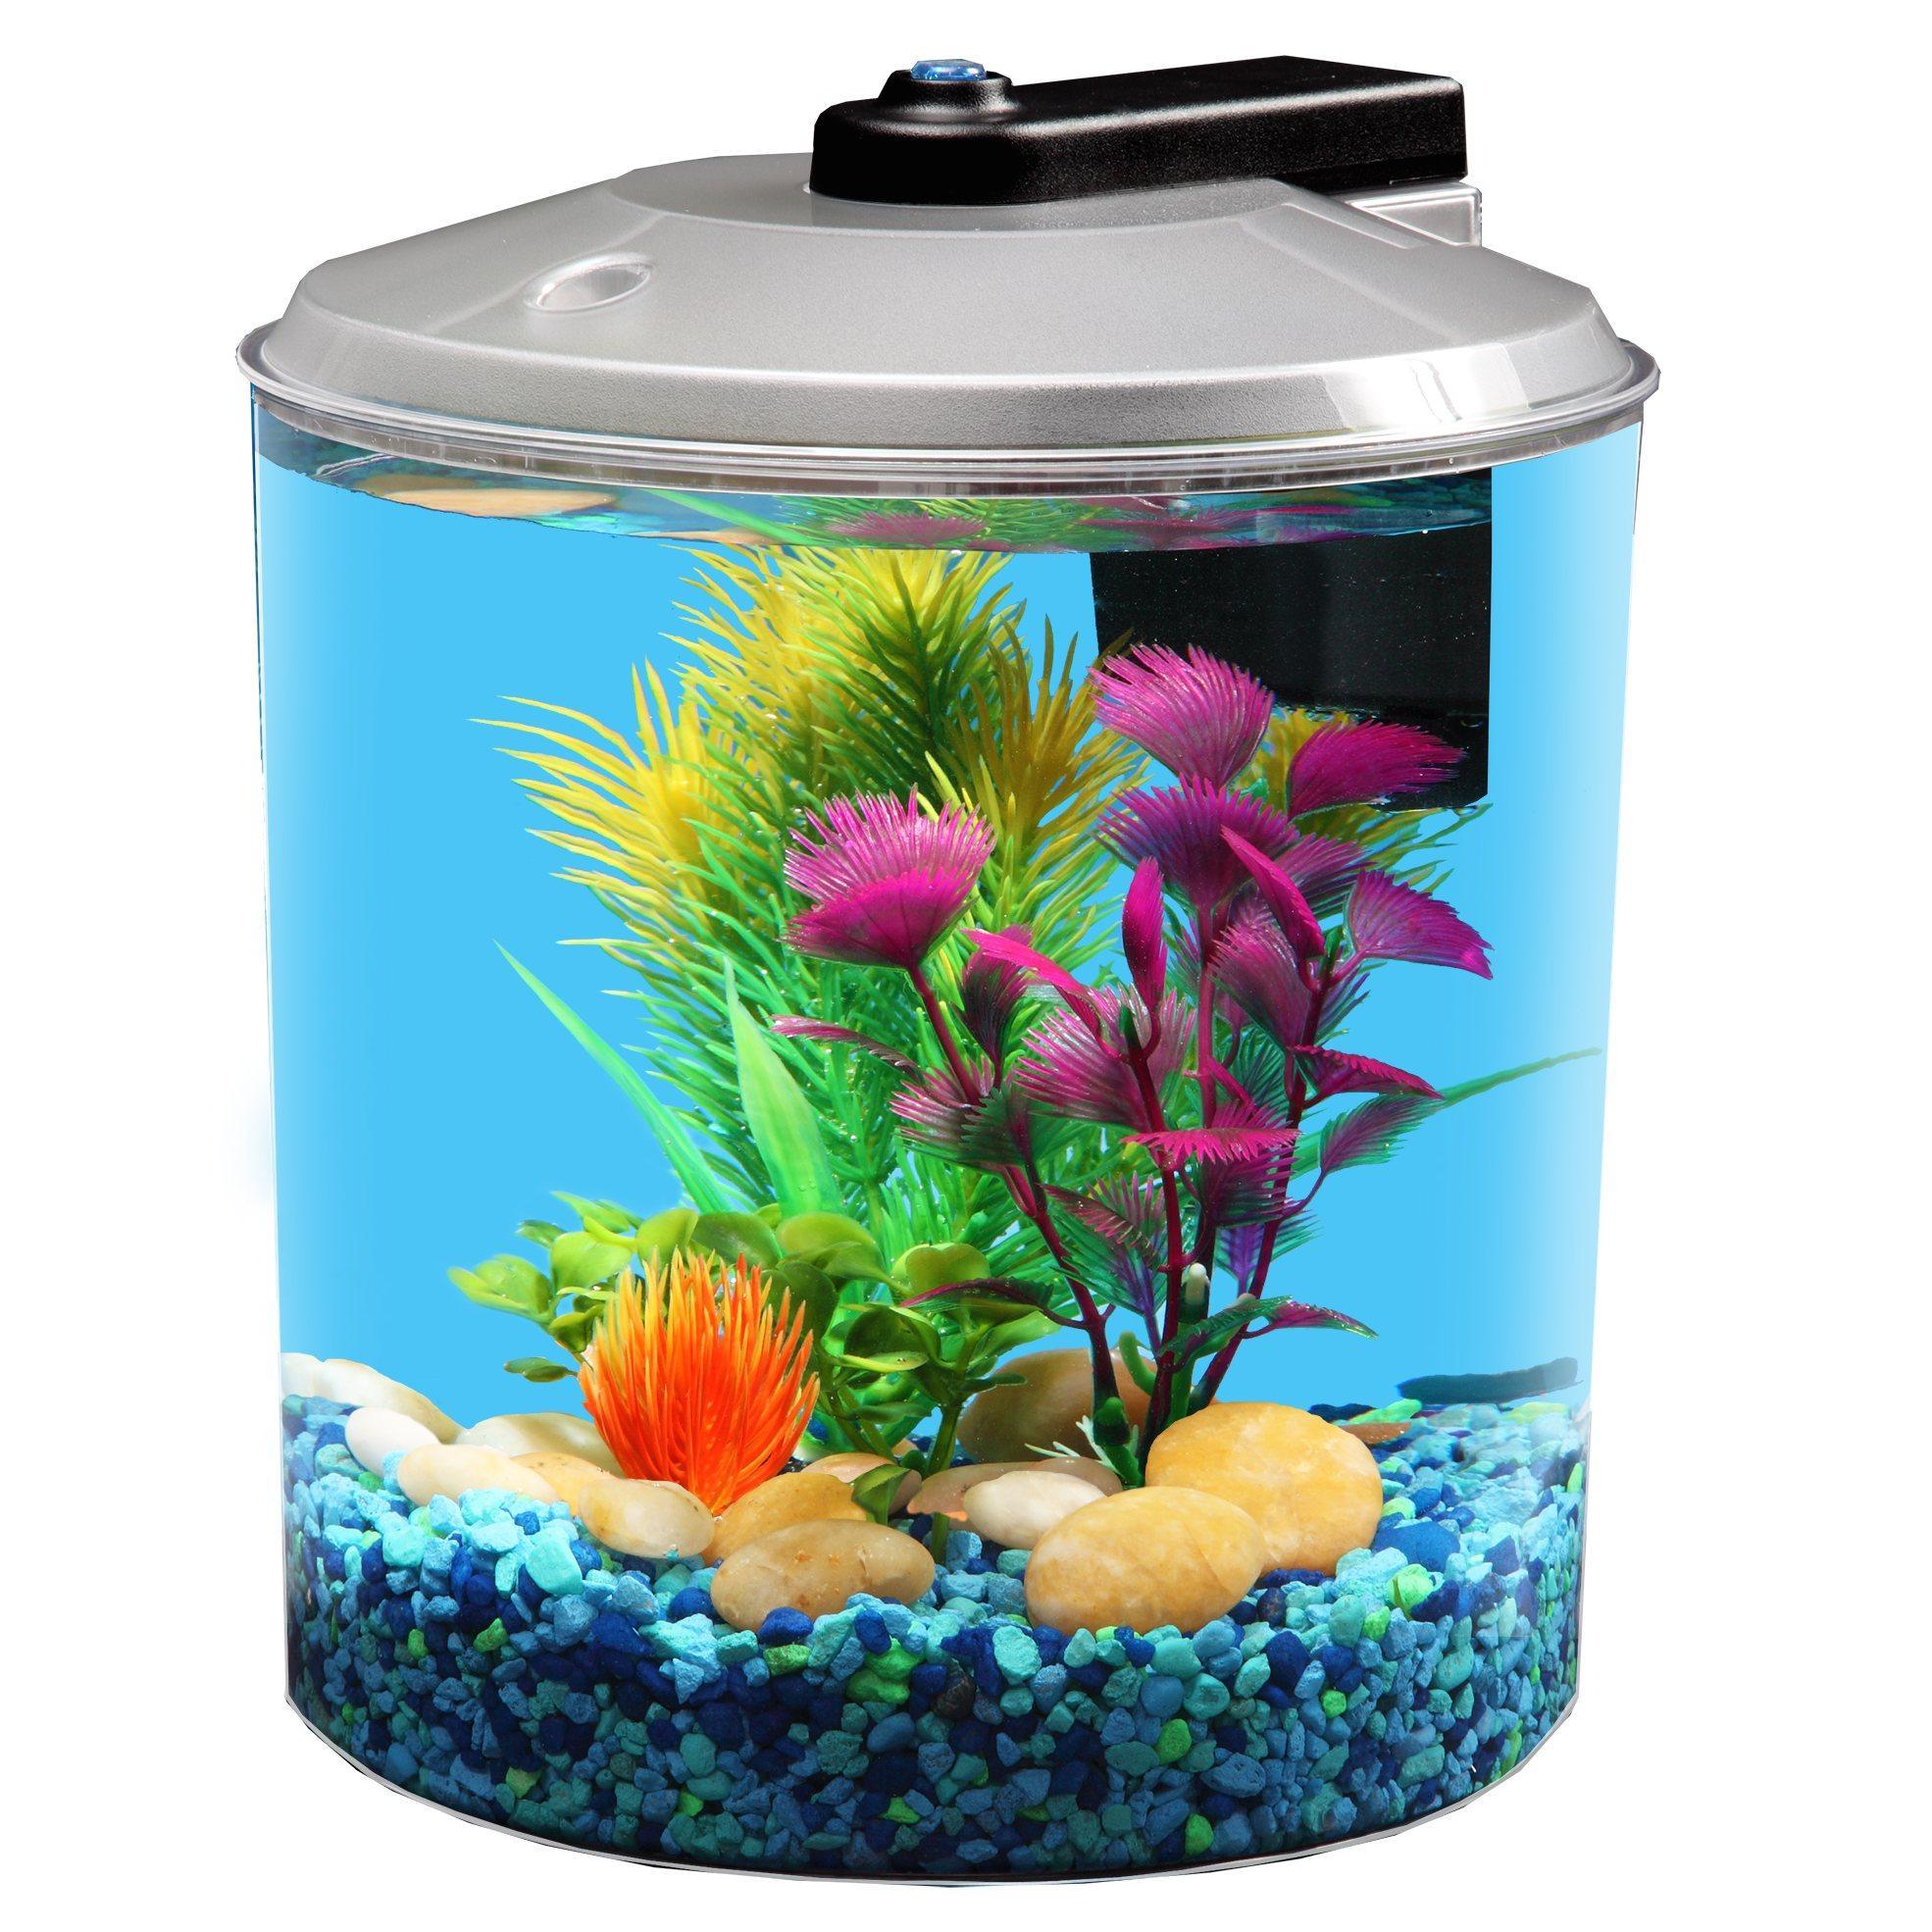 kollercraft api betta kit 360 degree fish tank 1 5 gallon pet supplies. Black Bedroom Furniture Sets. Home Design Ideas